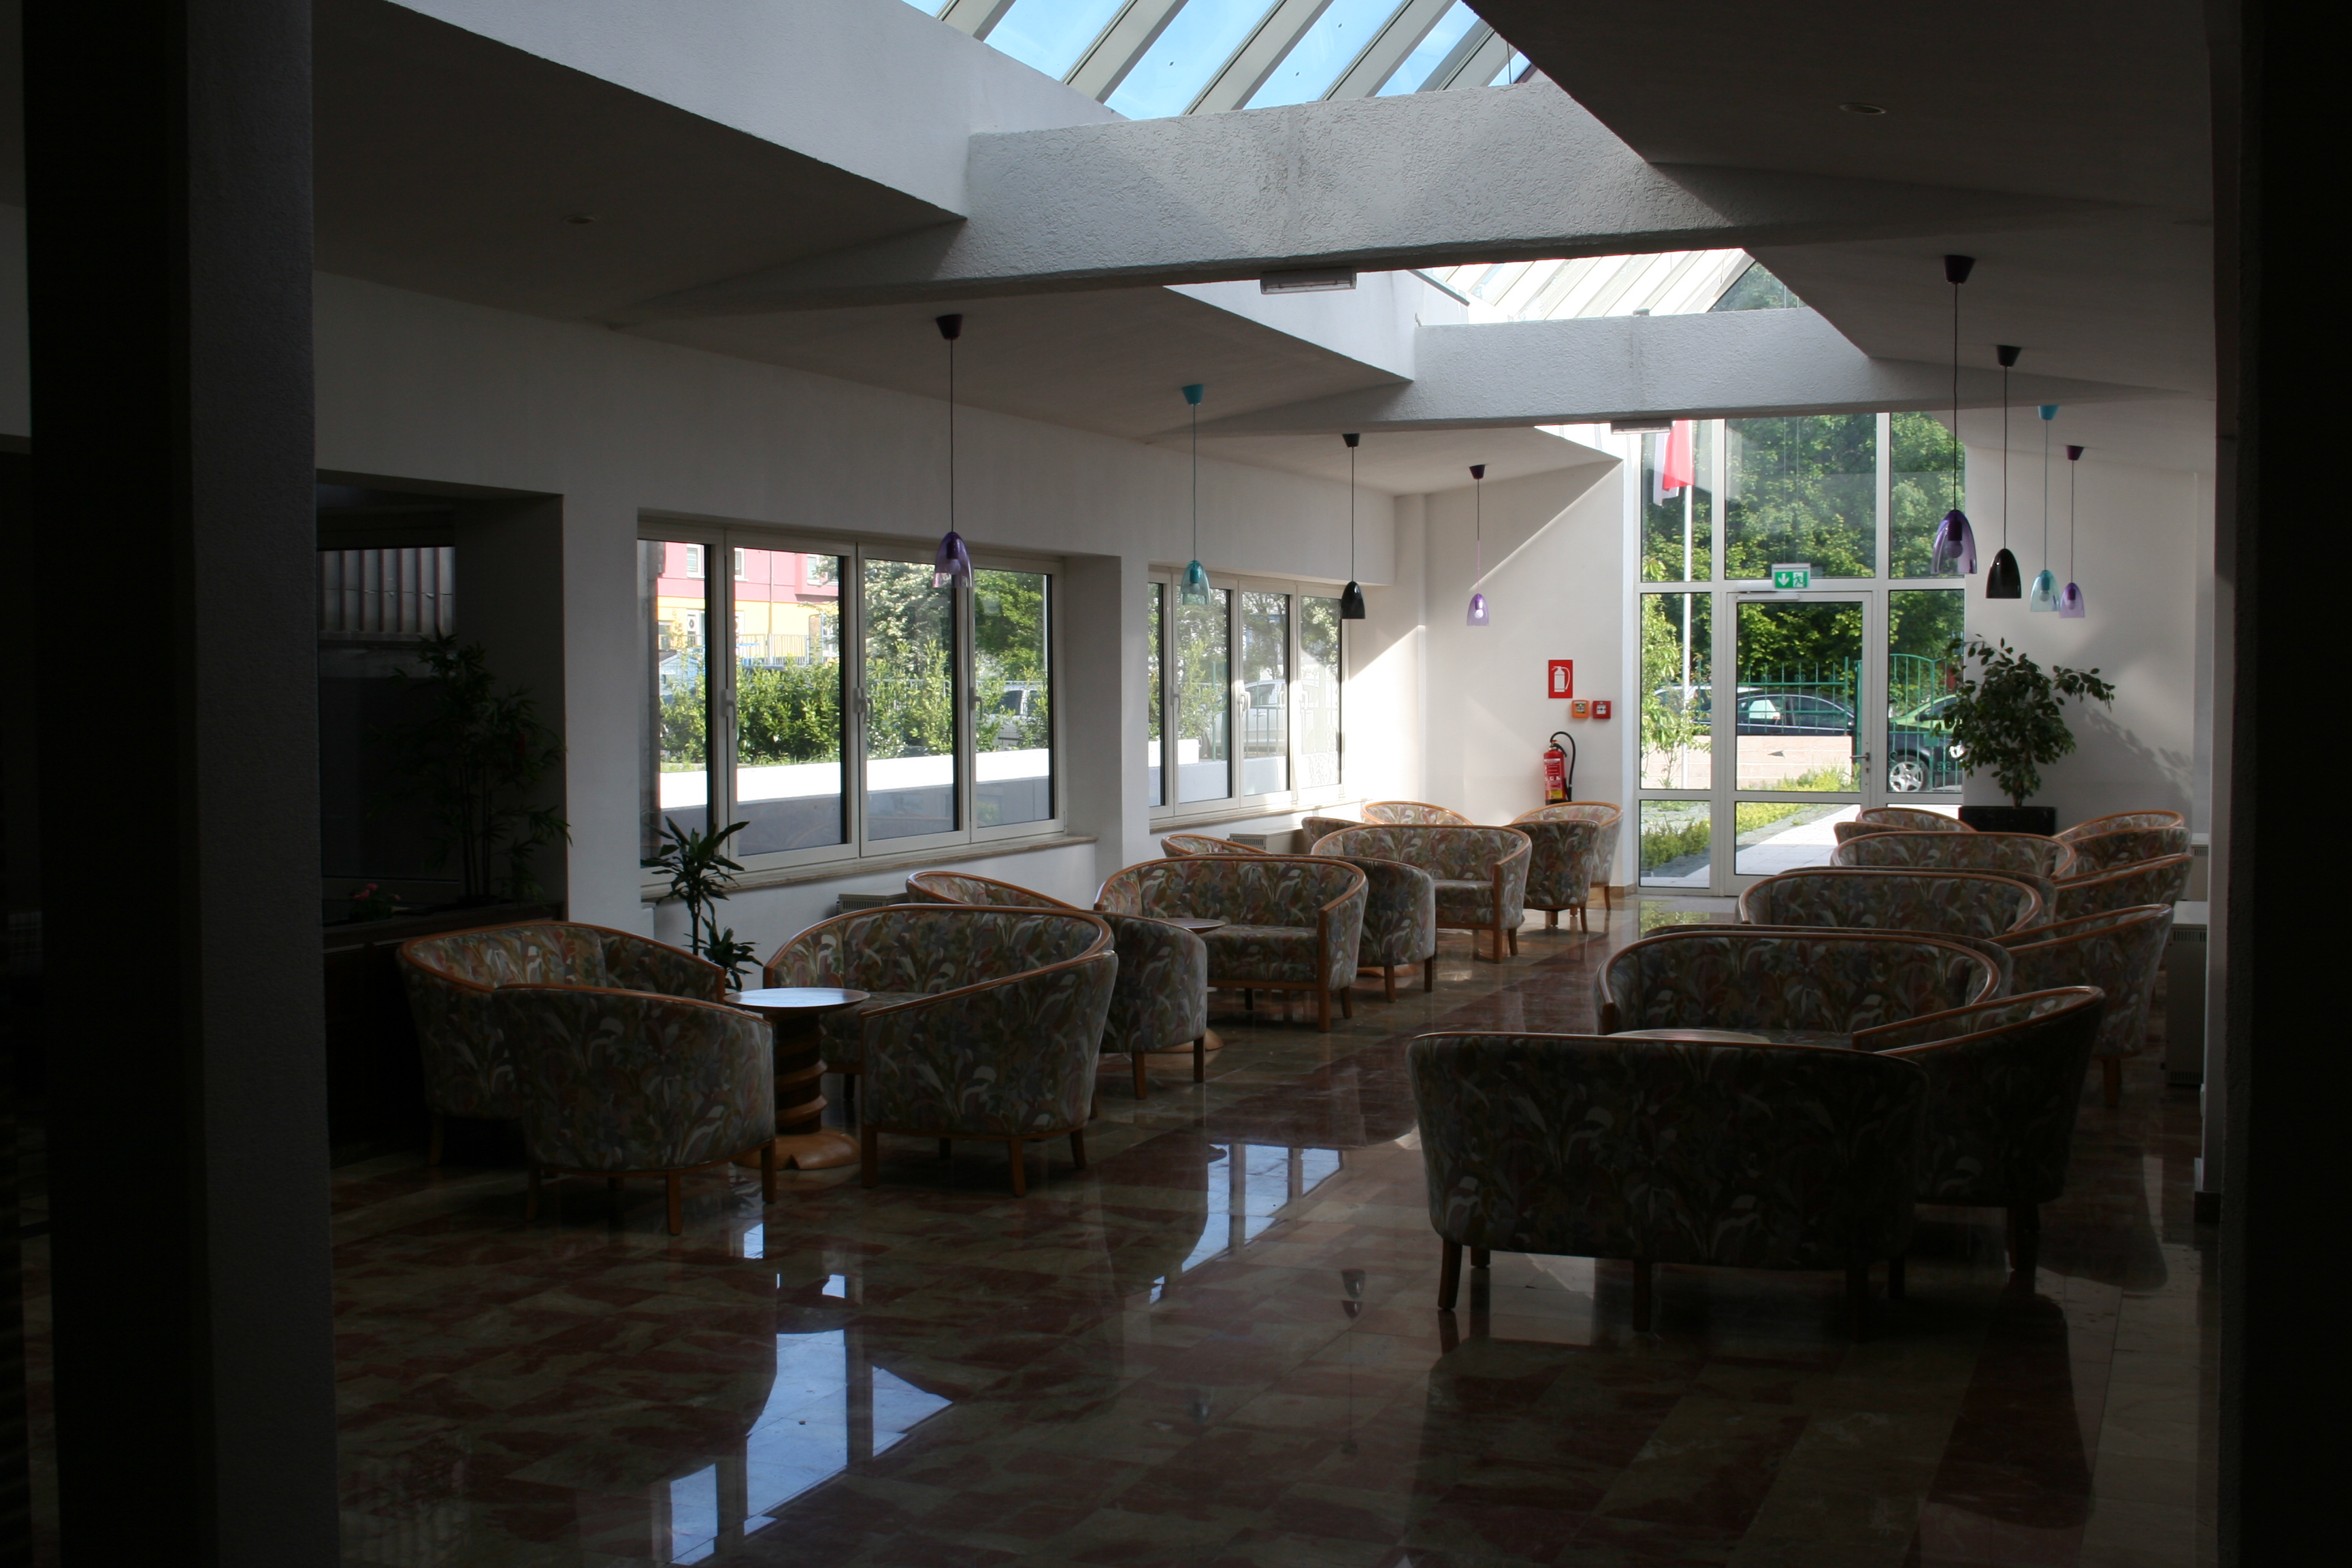 hotel pause hofheim frankfurt wiesbaden mainz. Black Bedroom Furniture Sets. Home Design Ideas